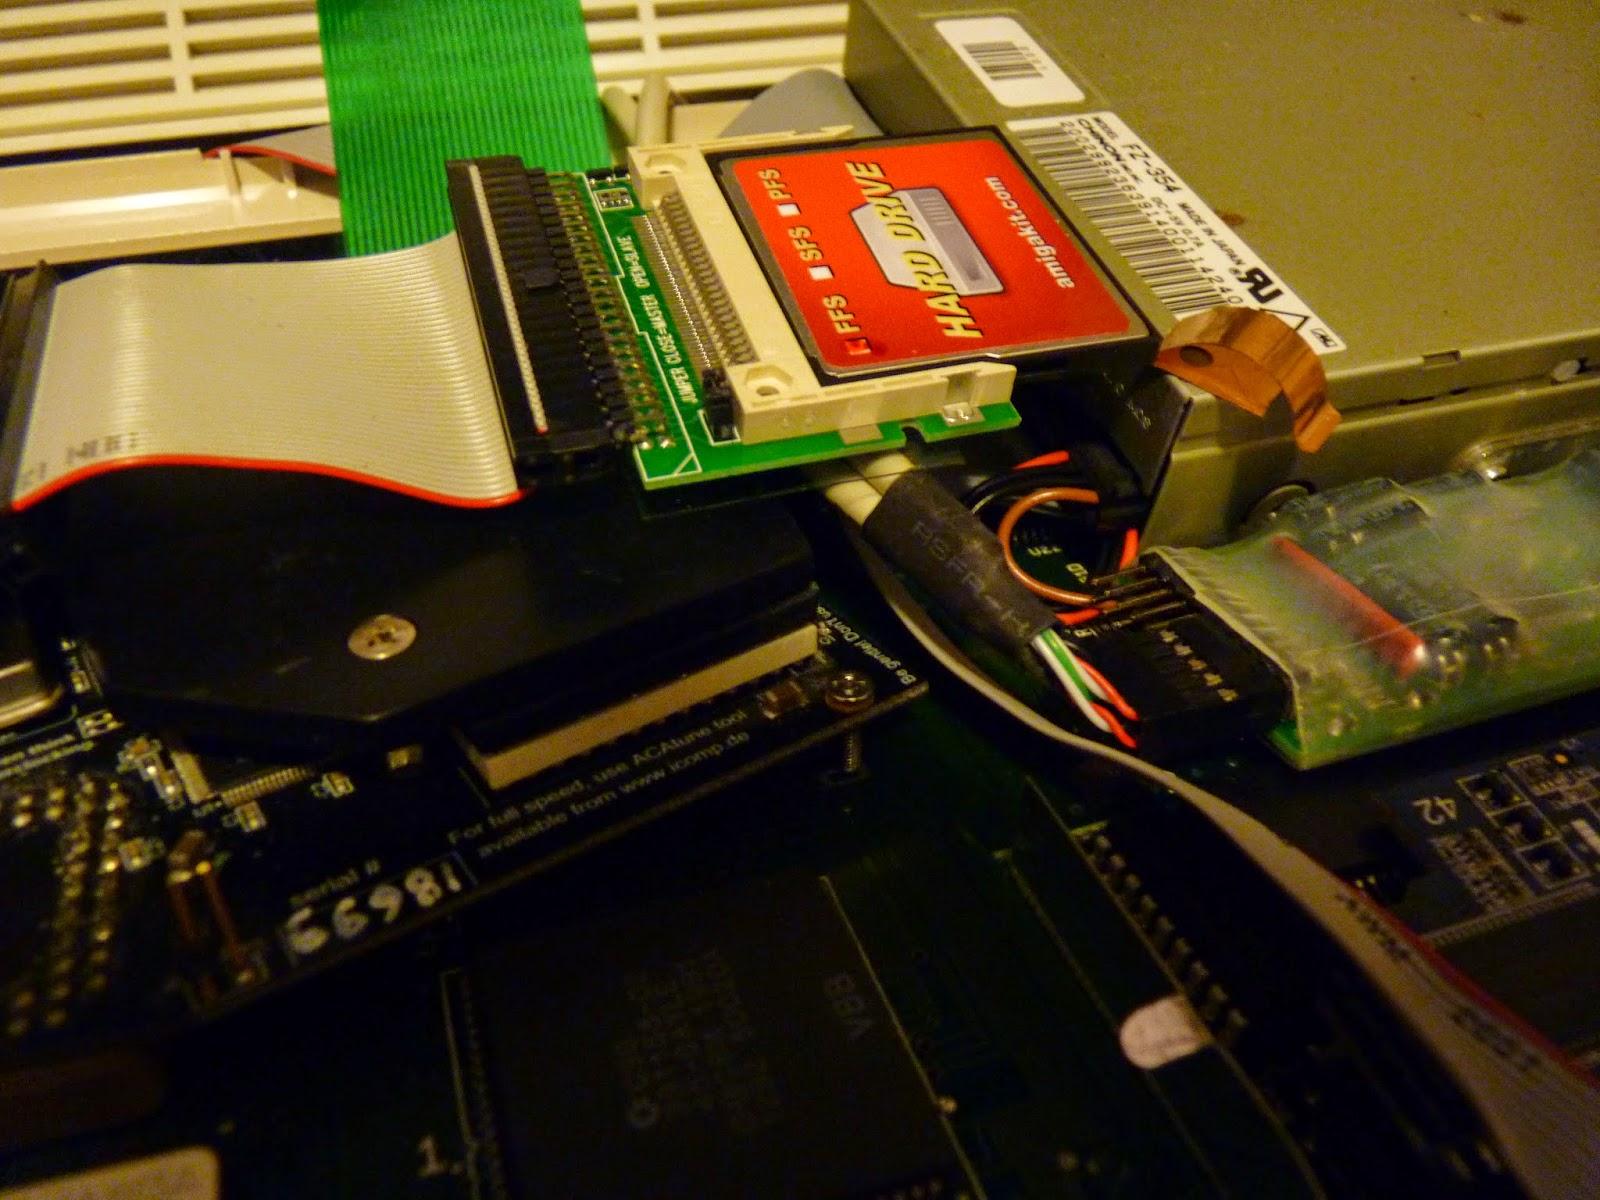 Epsilon's Amiga Blog: Amiga 600 CF AmigaOS Setup Part 1